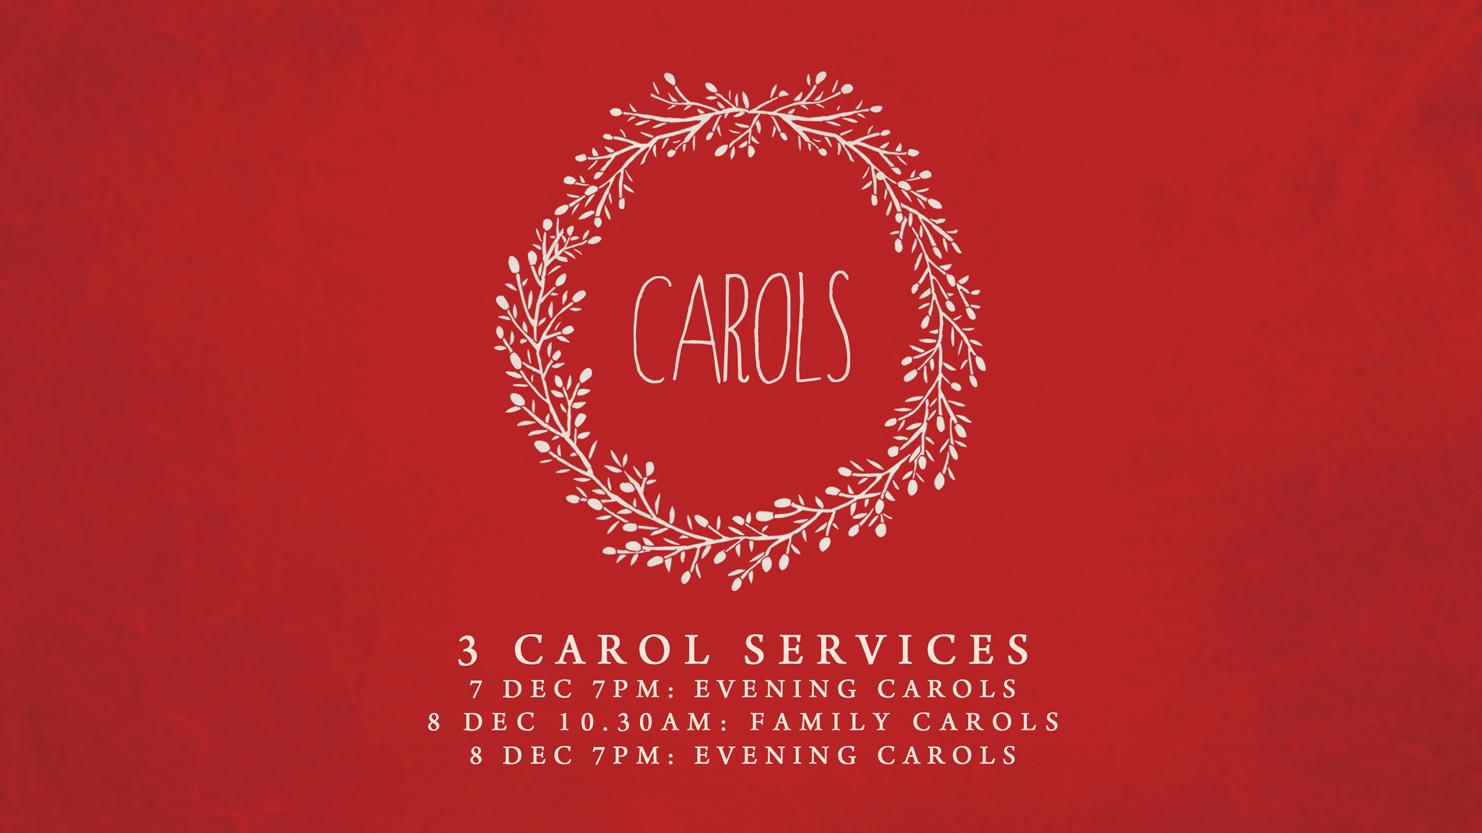 Carols-2013-ppt.jpg